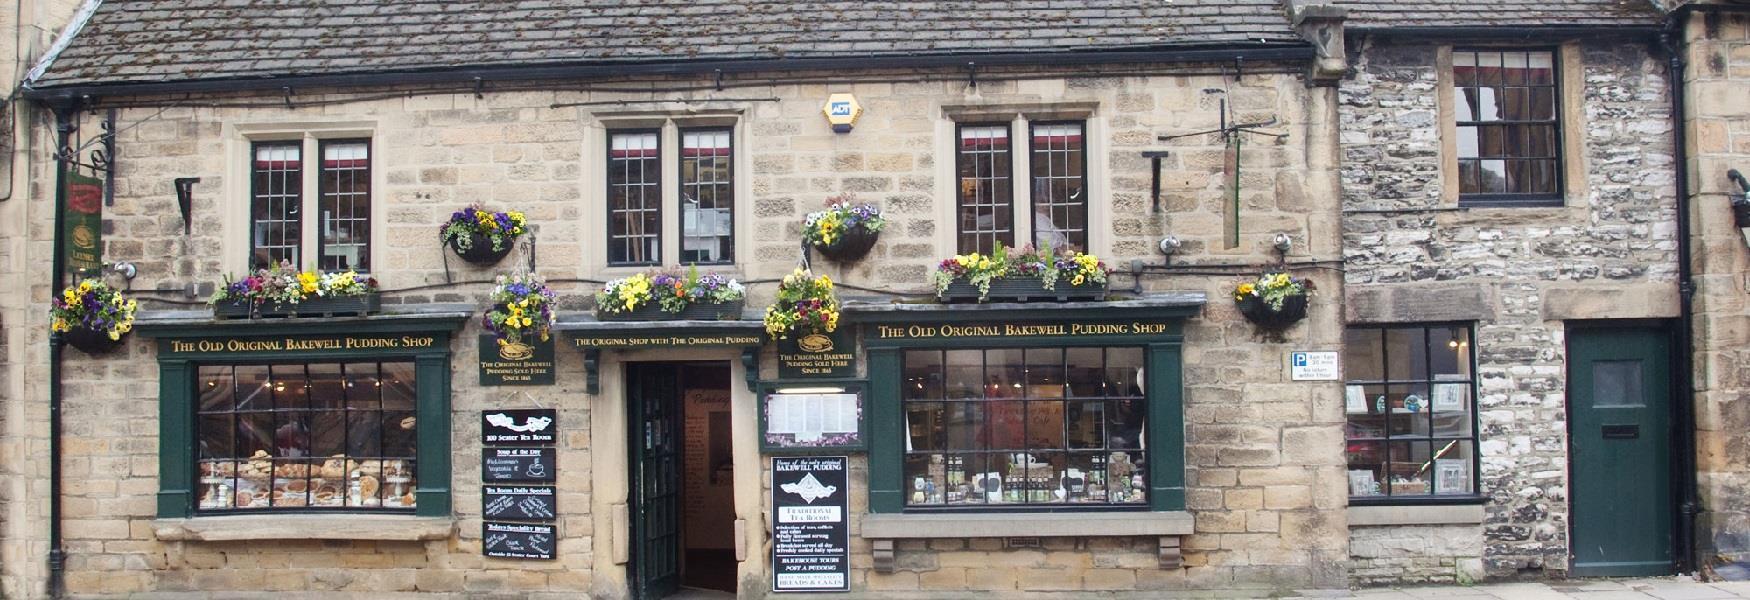 Old Original Bakewell Pudding Shop